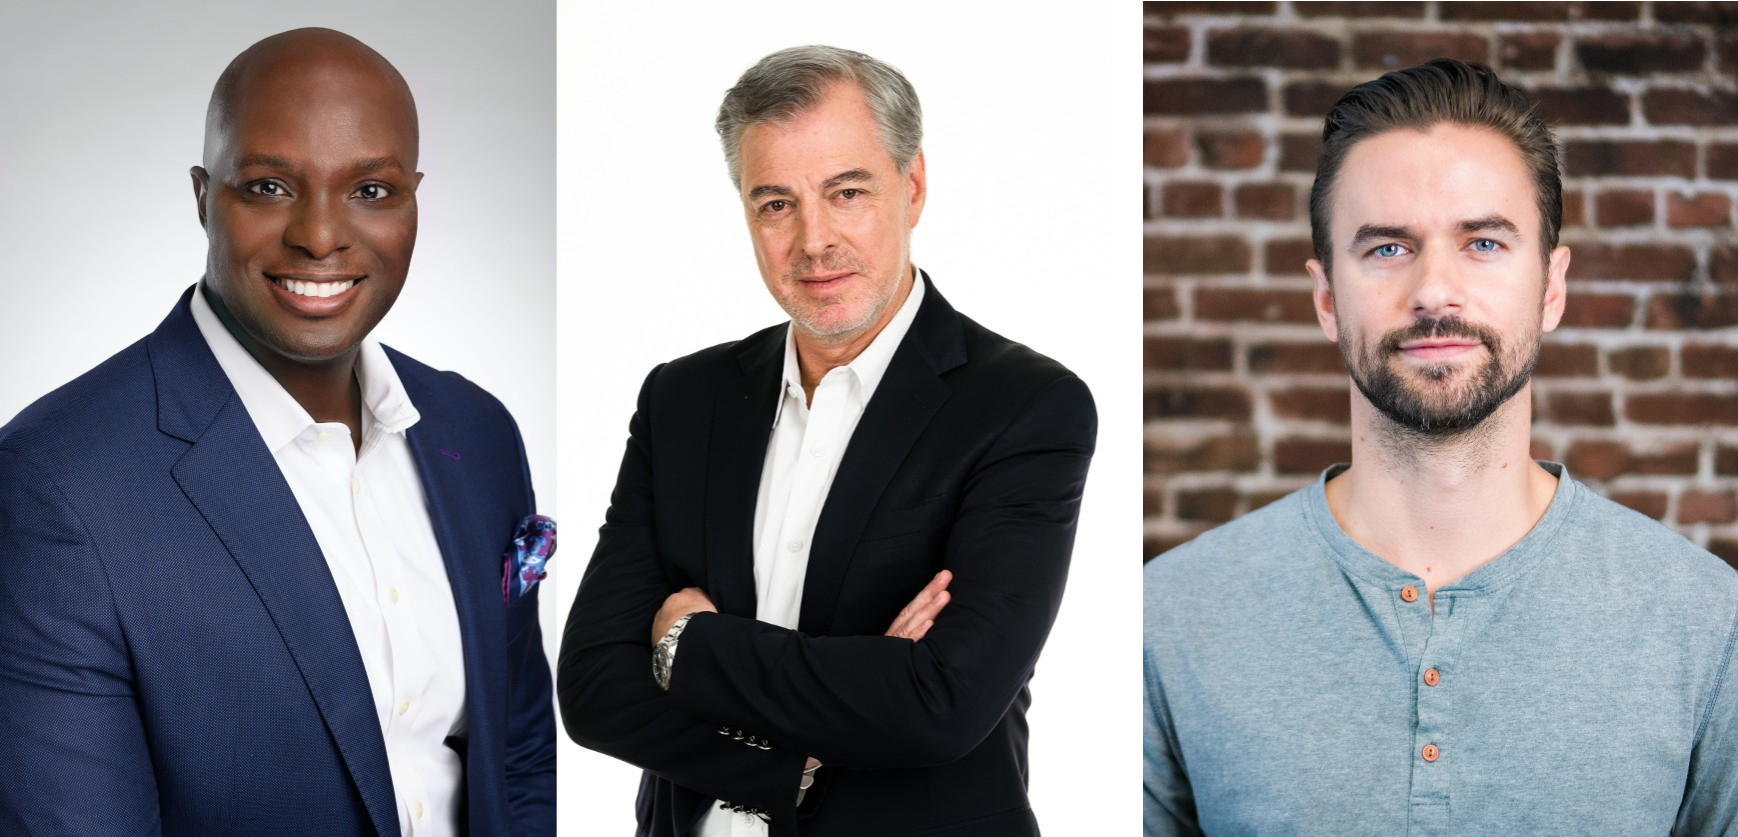 Interview: RealMe, Spectrum Labs and UrSafe Executives Discuss Revolutionary CheckPlus Security Tool